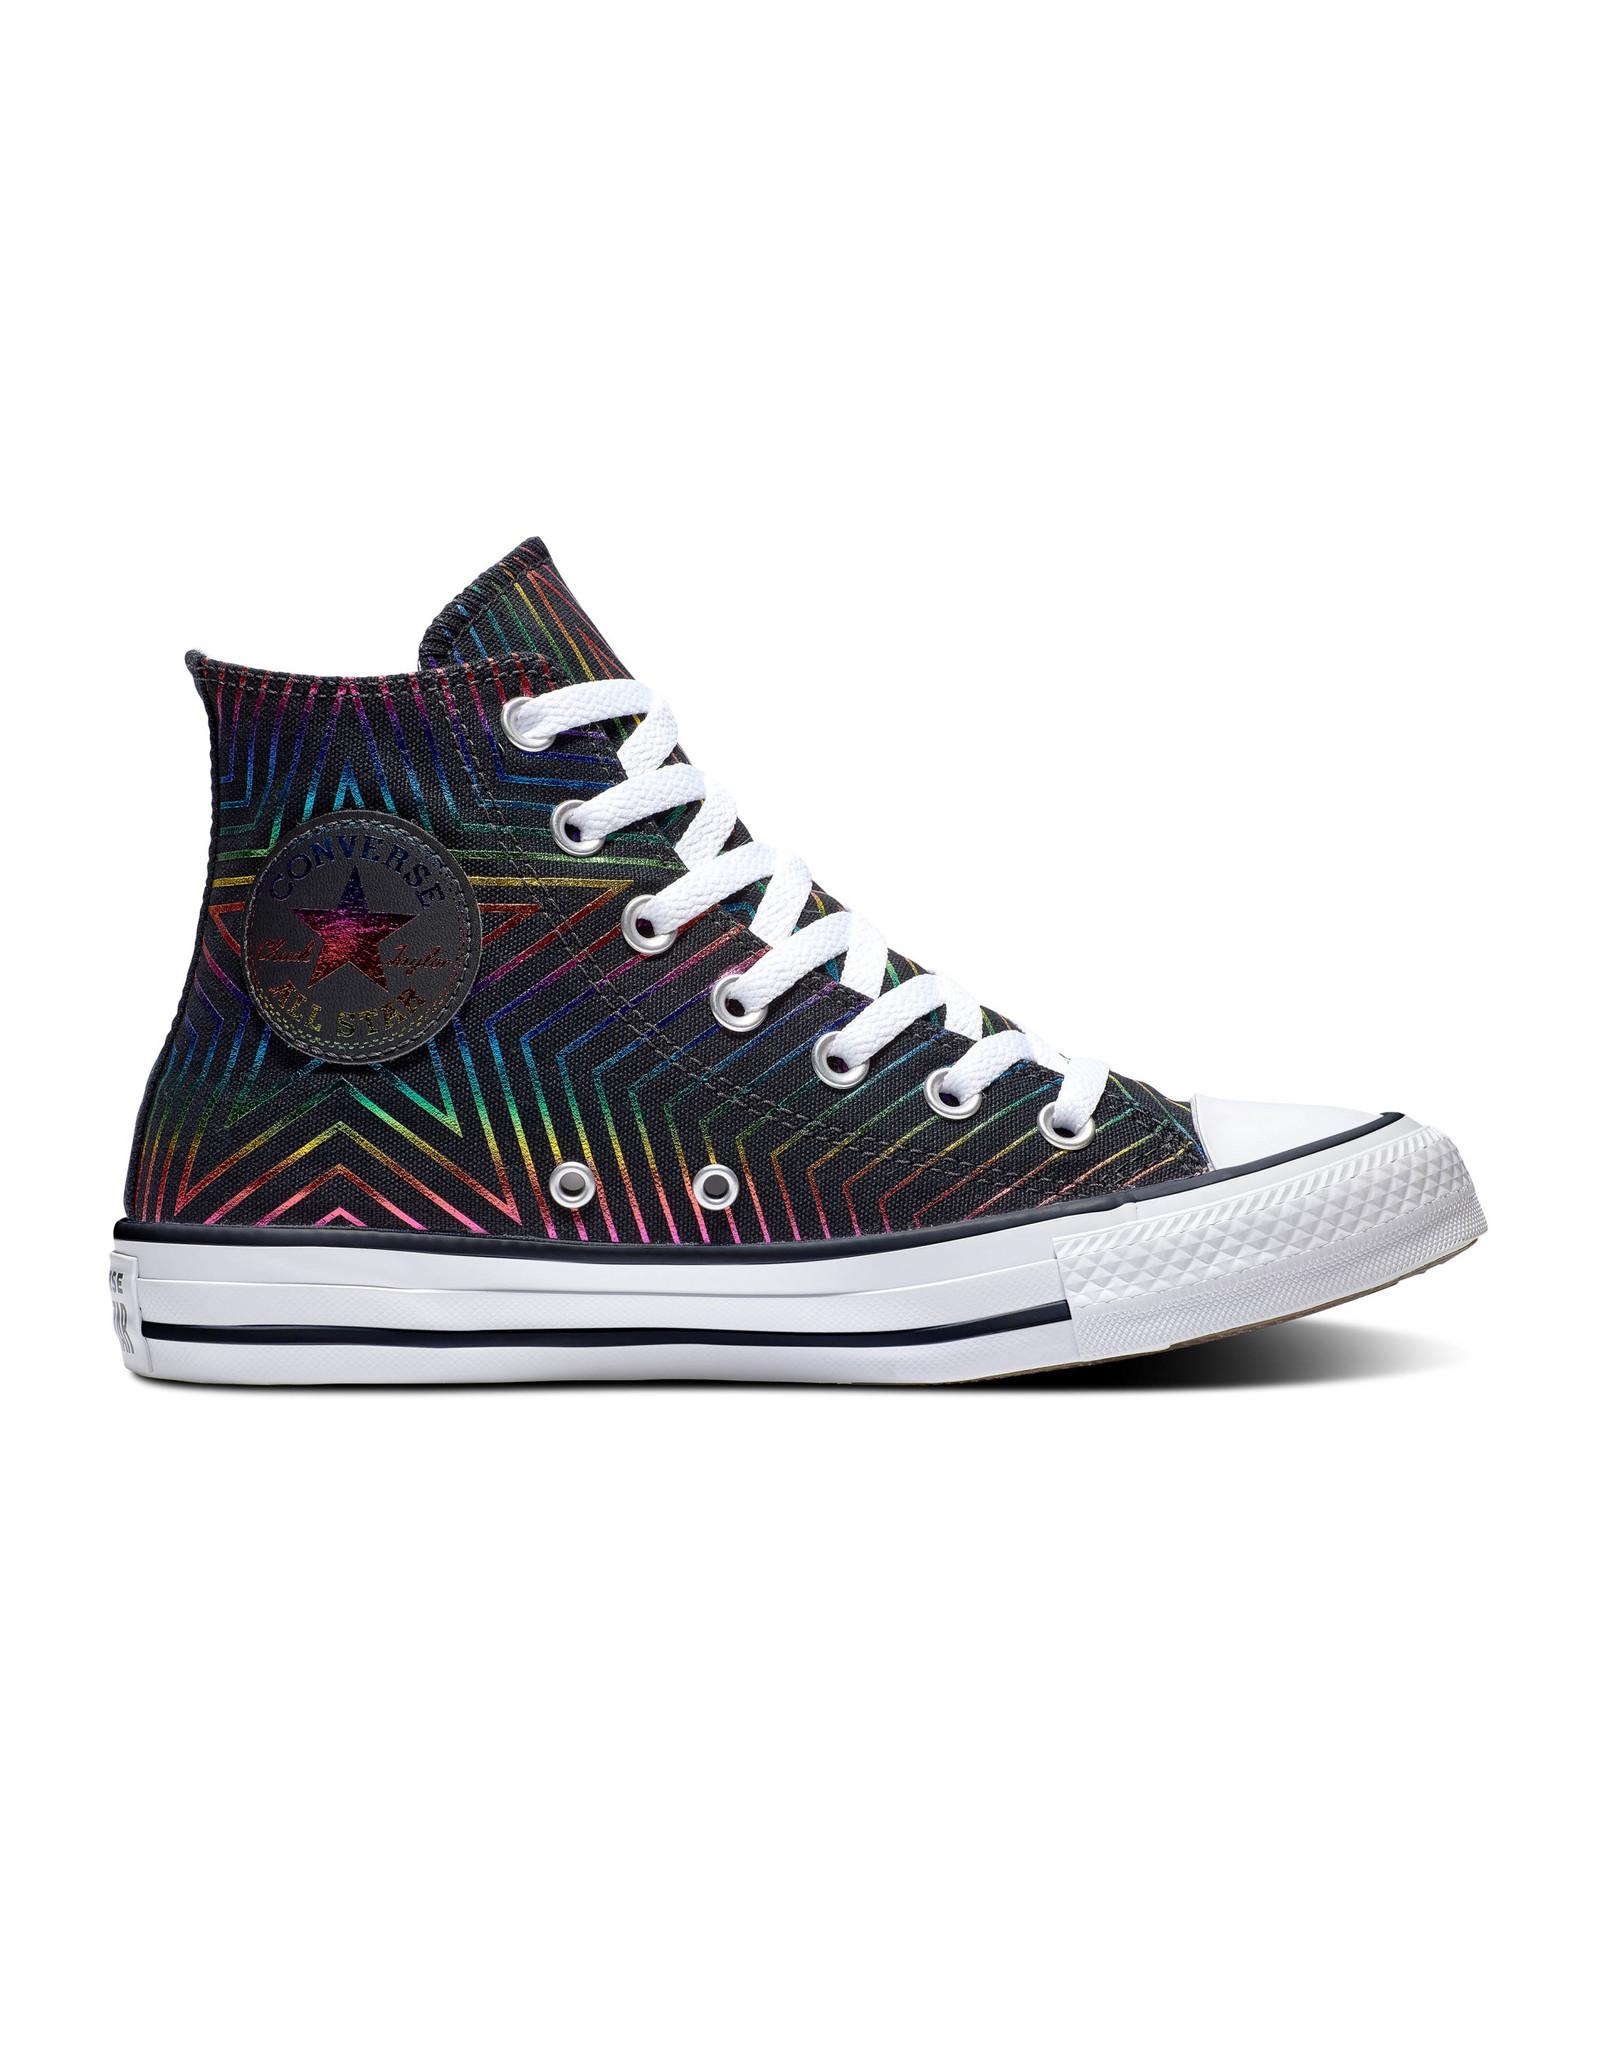 CONVERSE CHUCK TAYLOR ALL STAR HI BLACK/WHITE/BLACK C19STAB-565395C